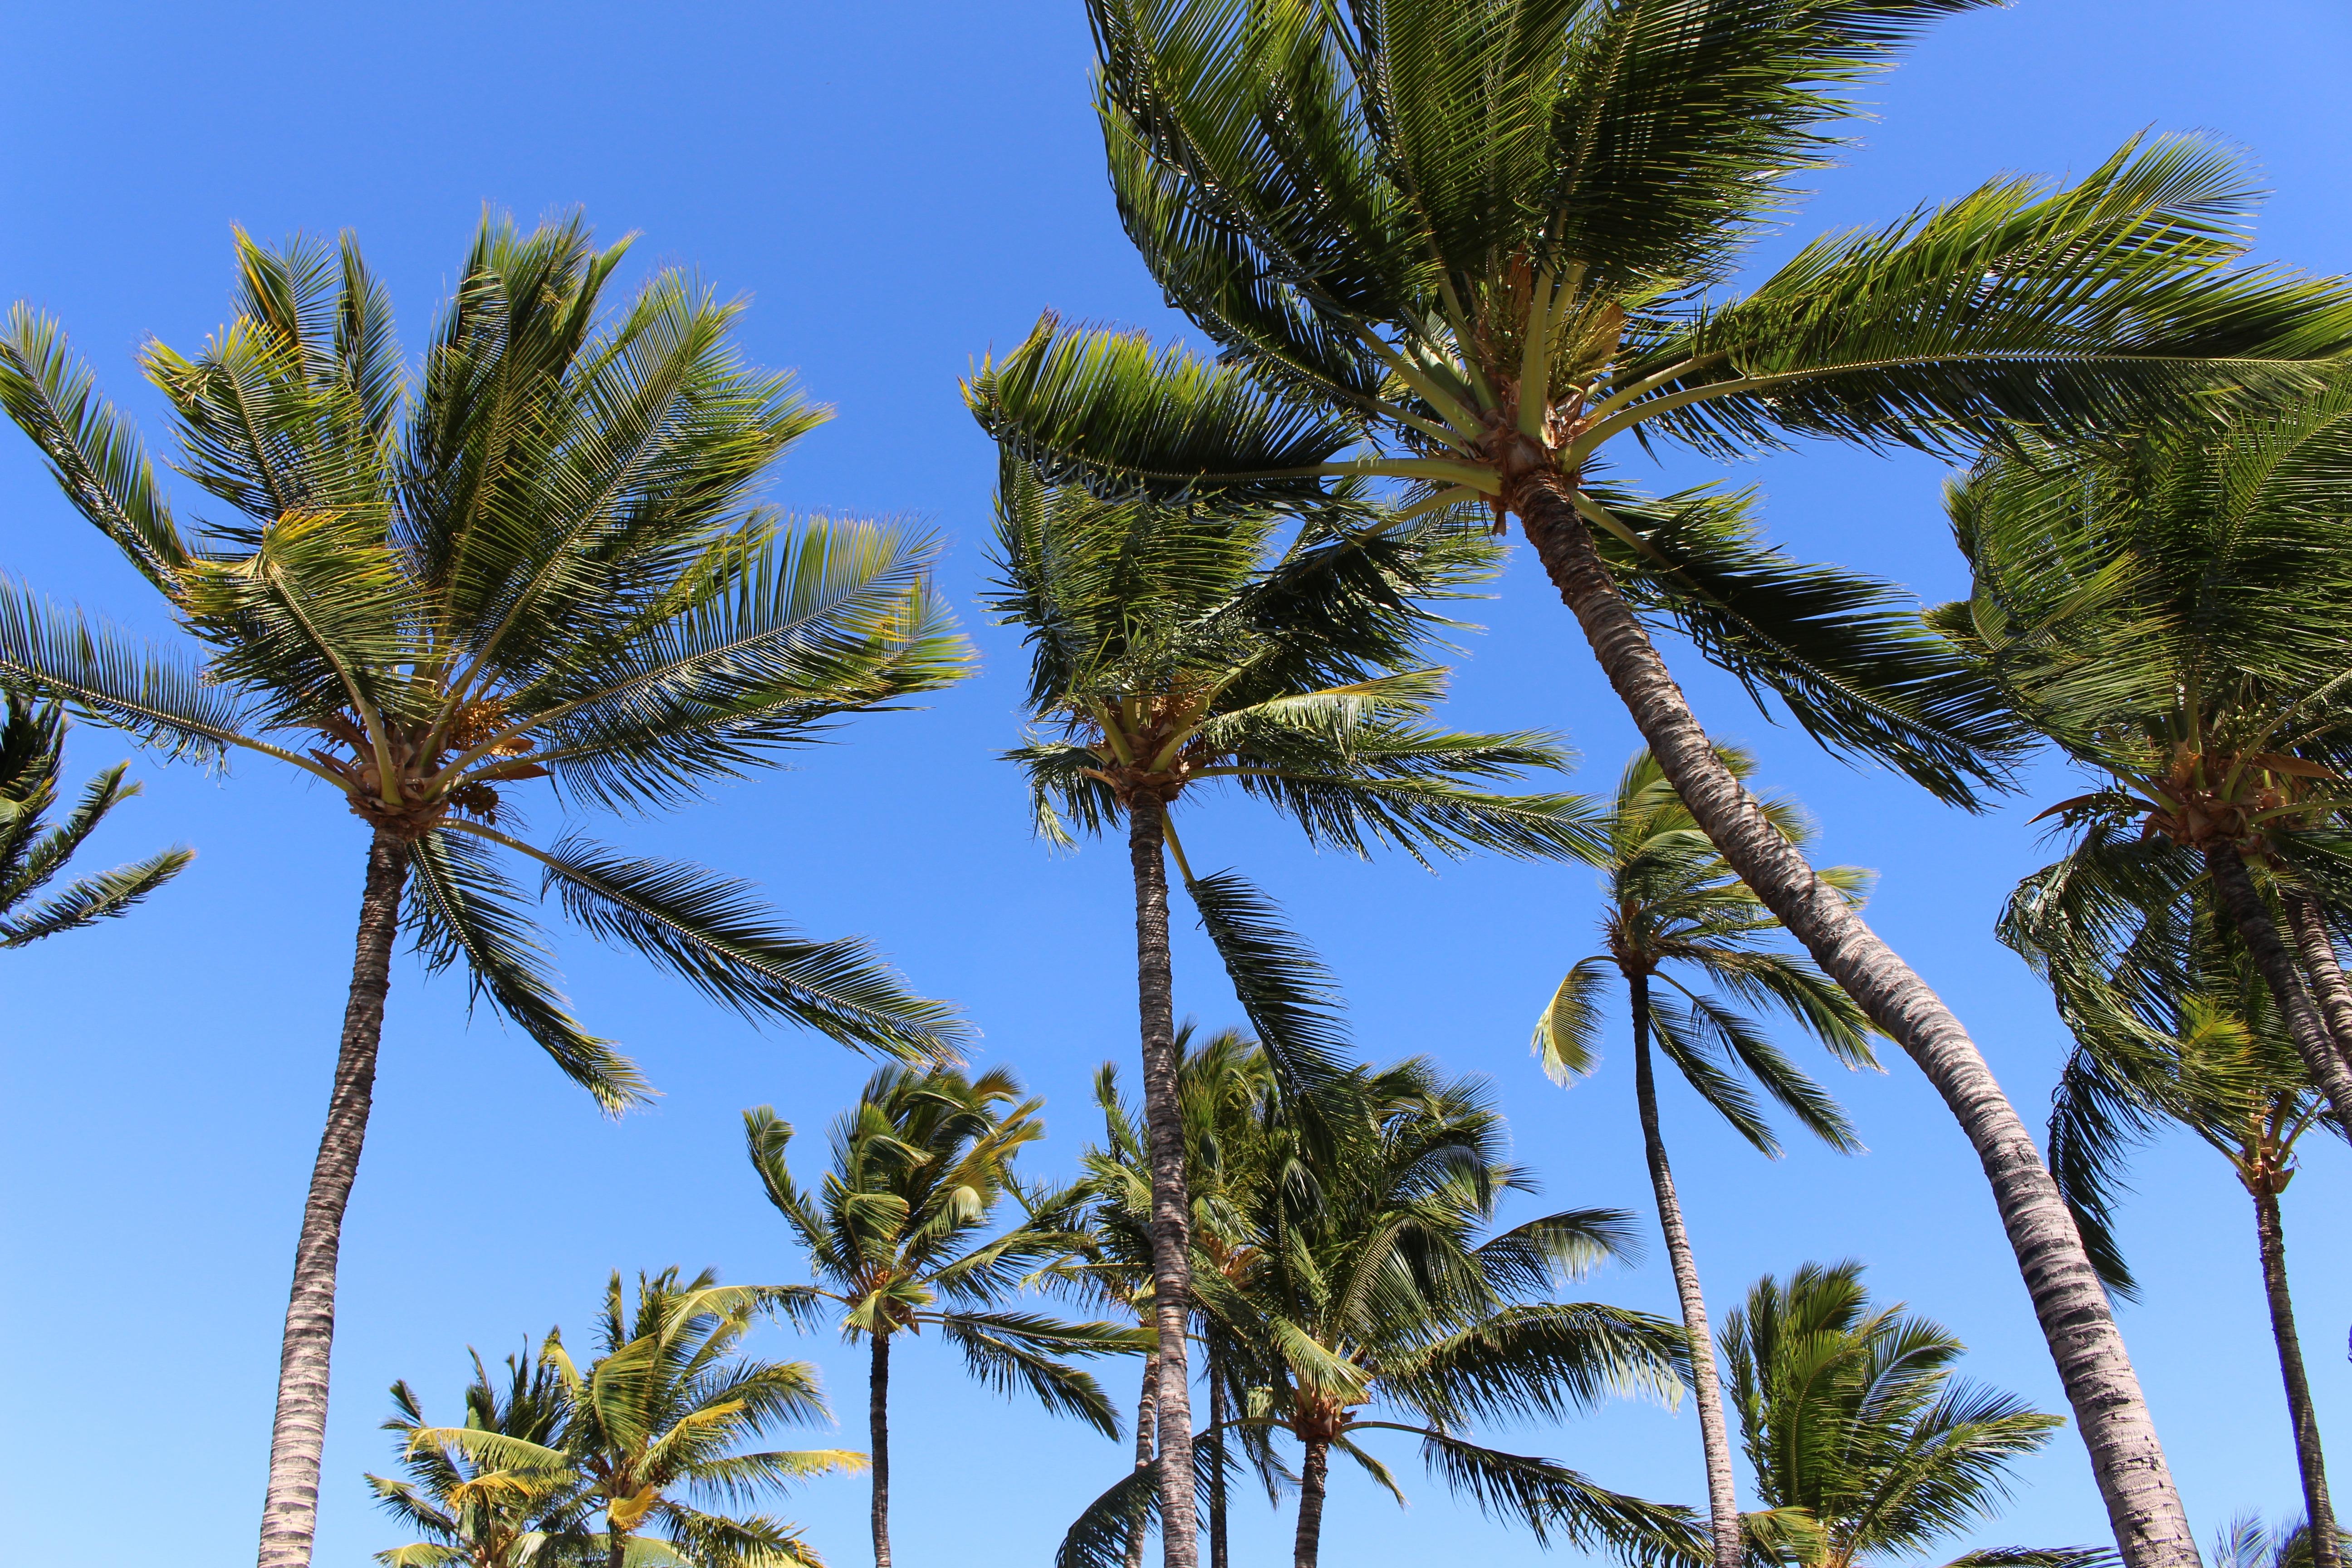 Havaijin dating sites